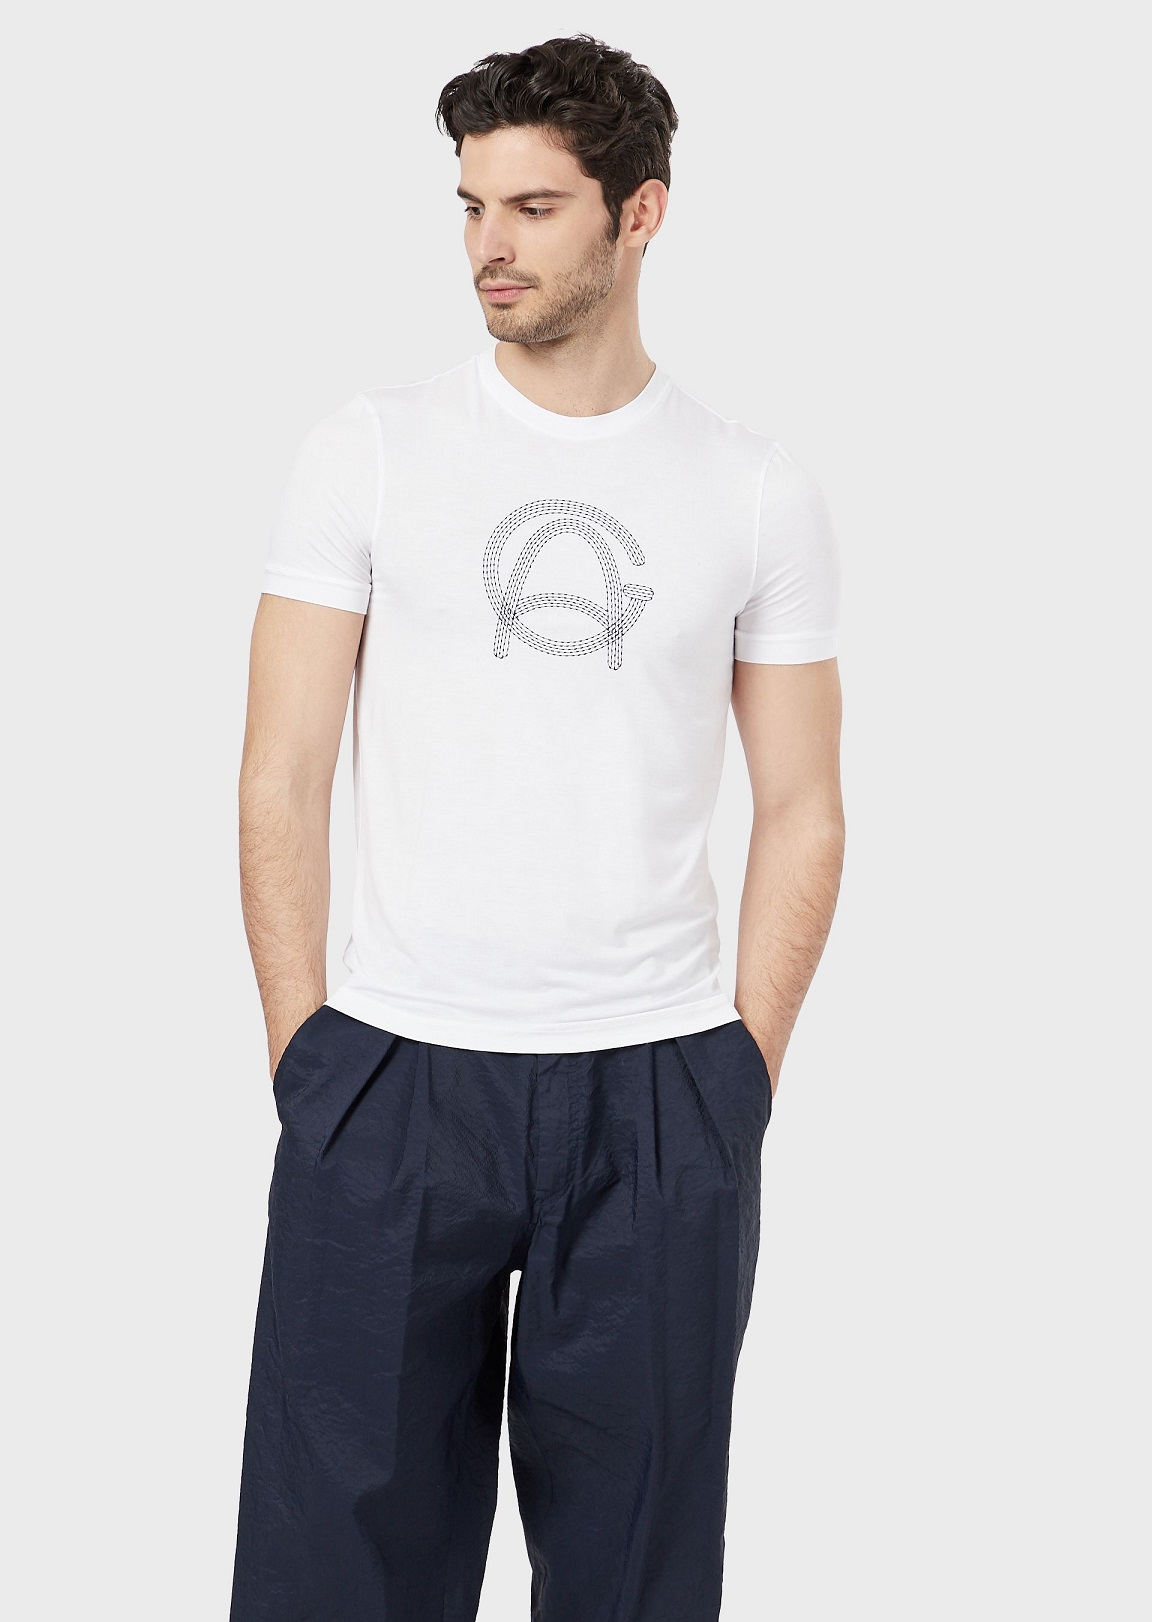 GIORGIO ARMANI(ジョルジオ・アルマーニ) メンズTシャツ